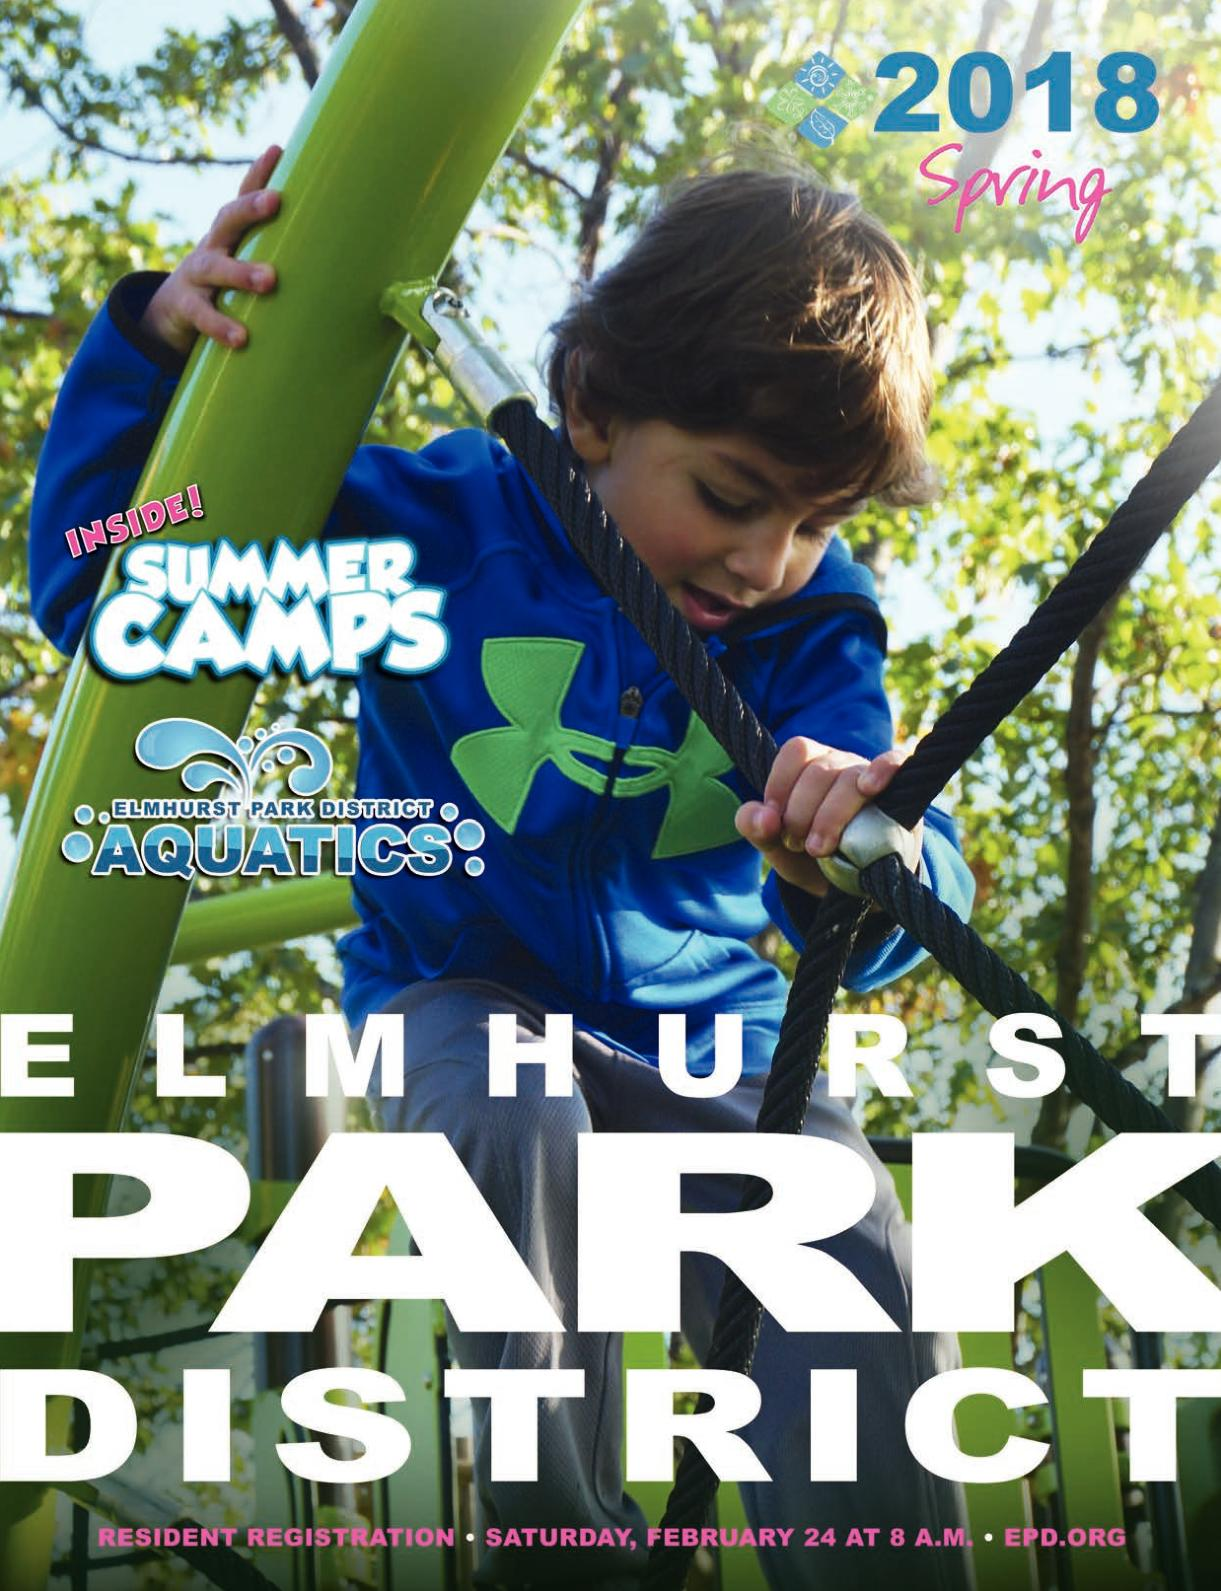 Calamo Elmhurst Park District Spring 2018 Brochure To Refreshment The Knot Head Part I Mastering Eldredge